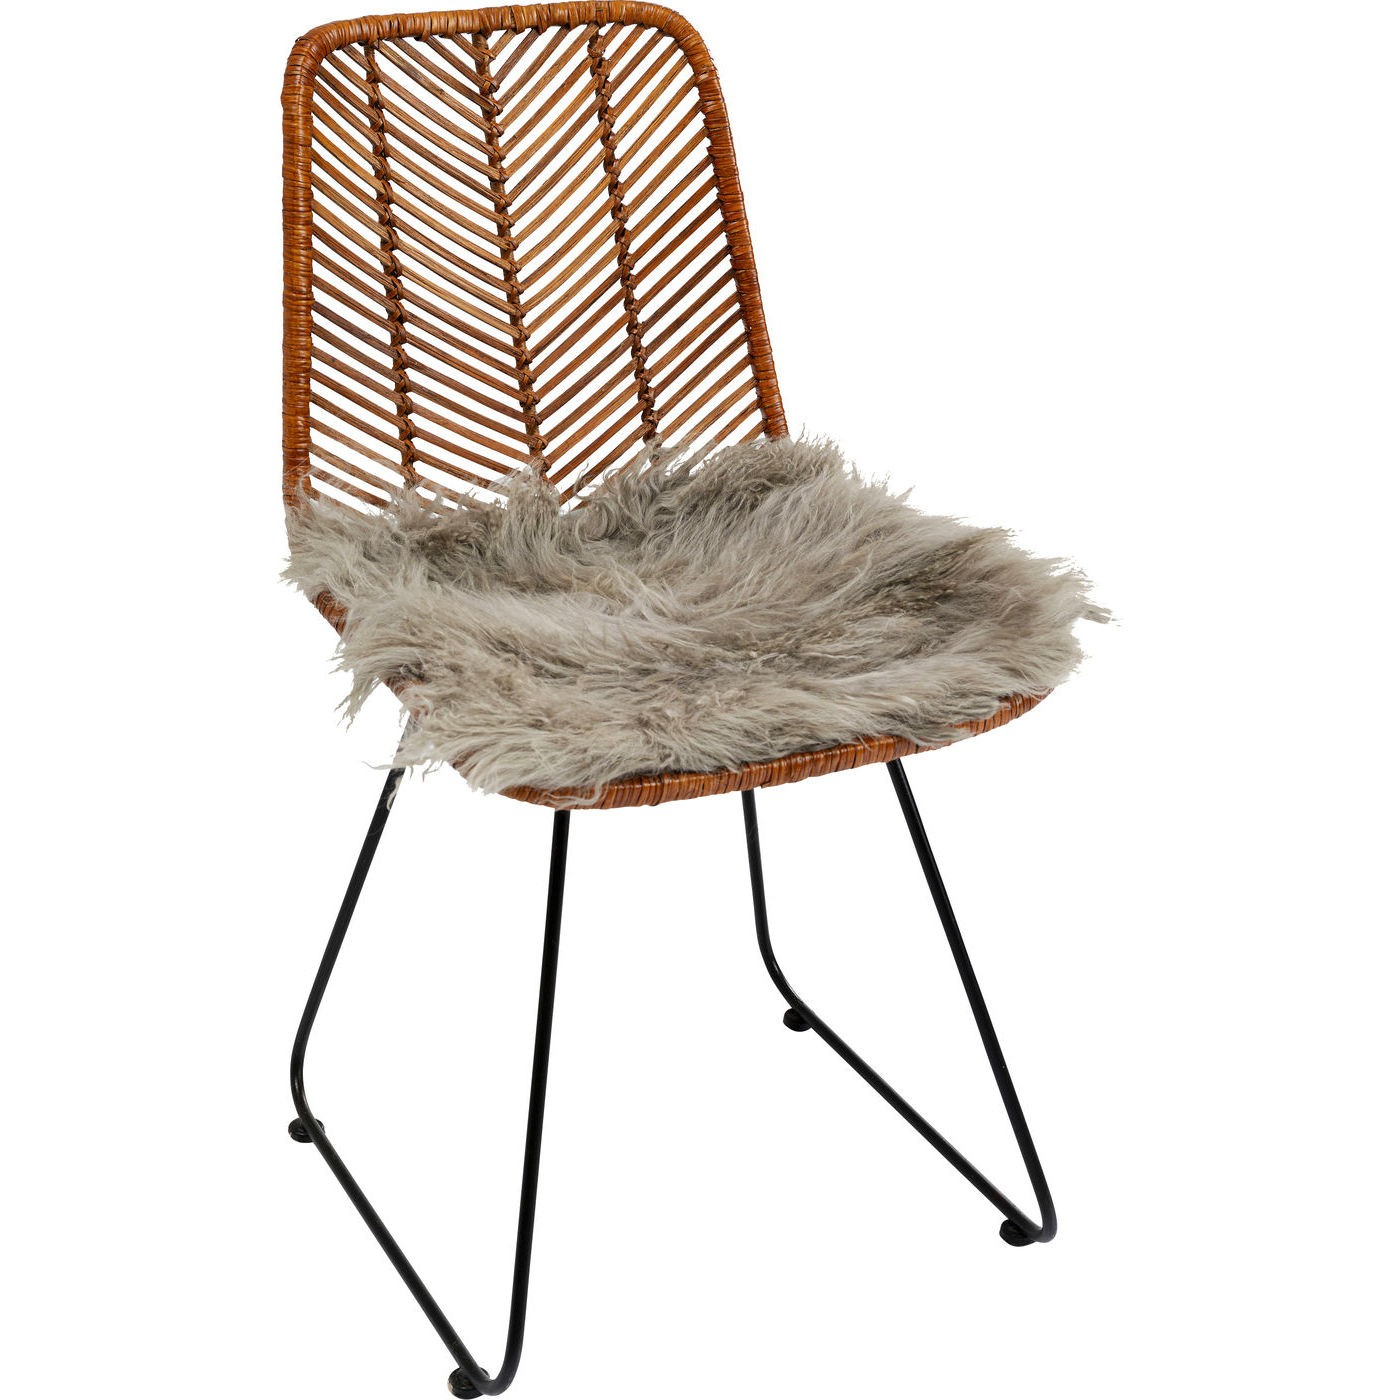 Galette de chaise Heidi grise 40x40cm Kare Design